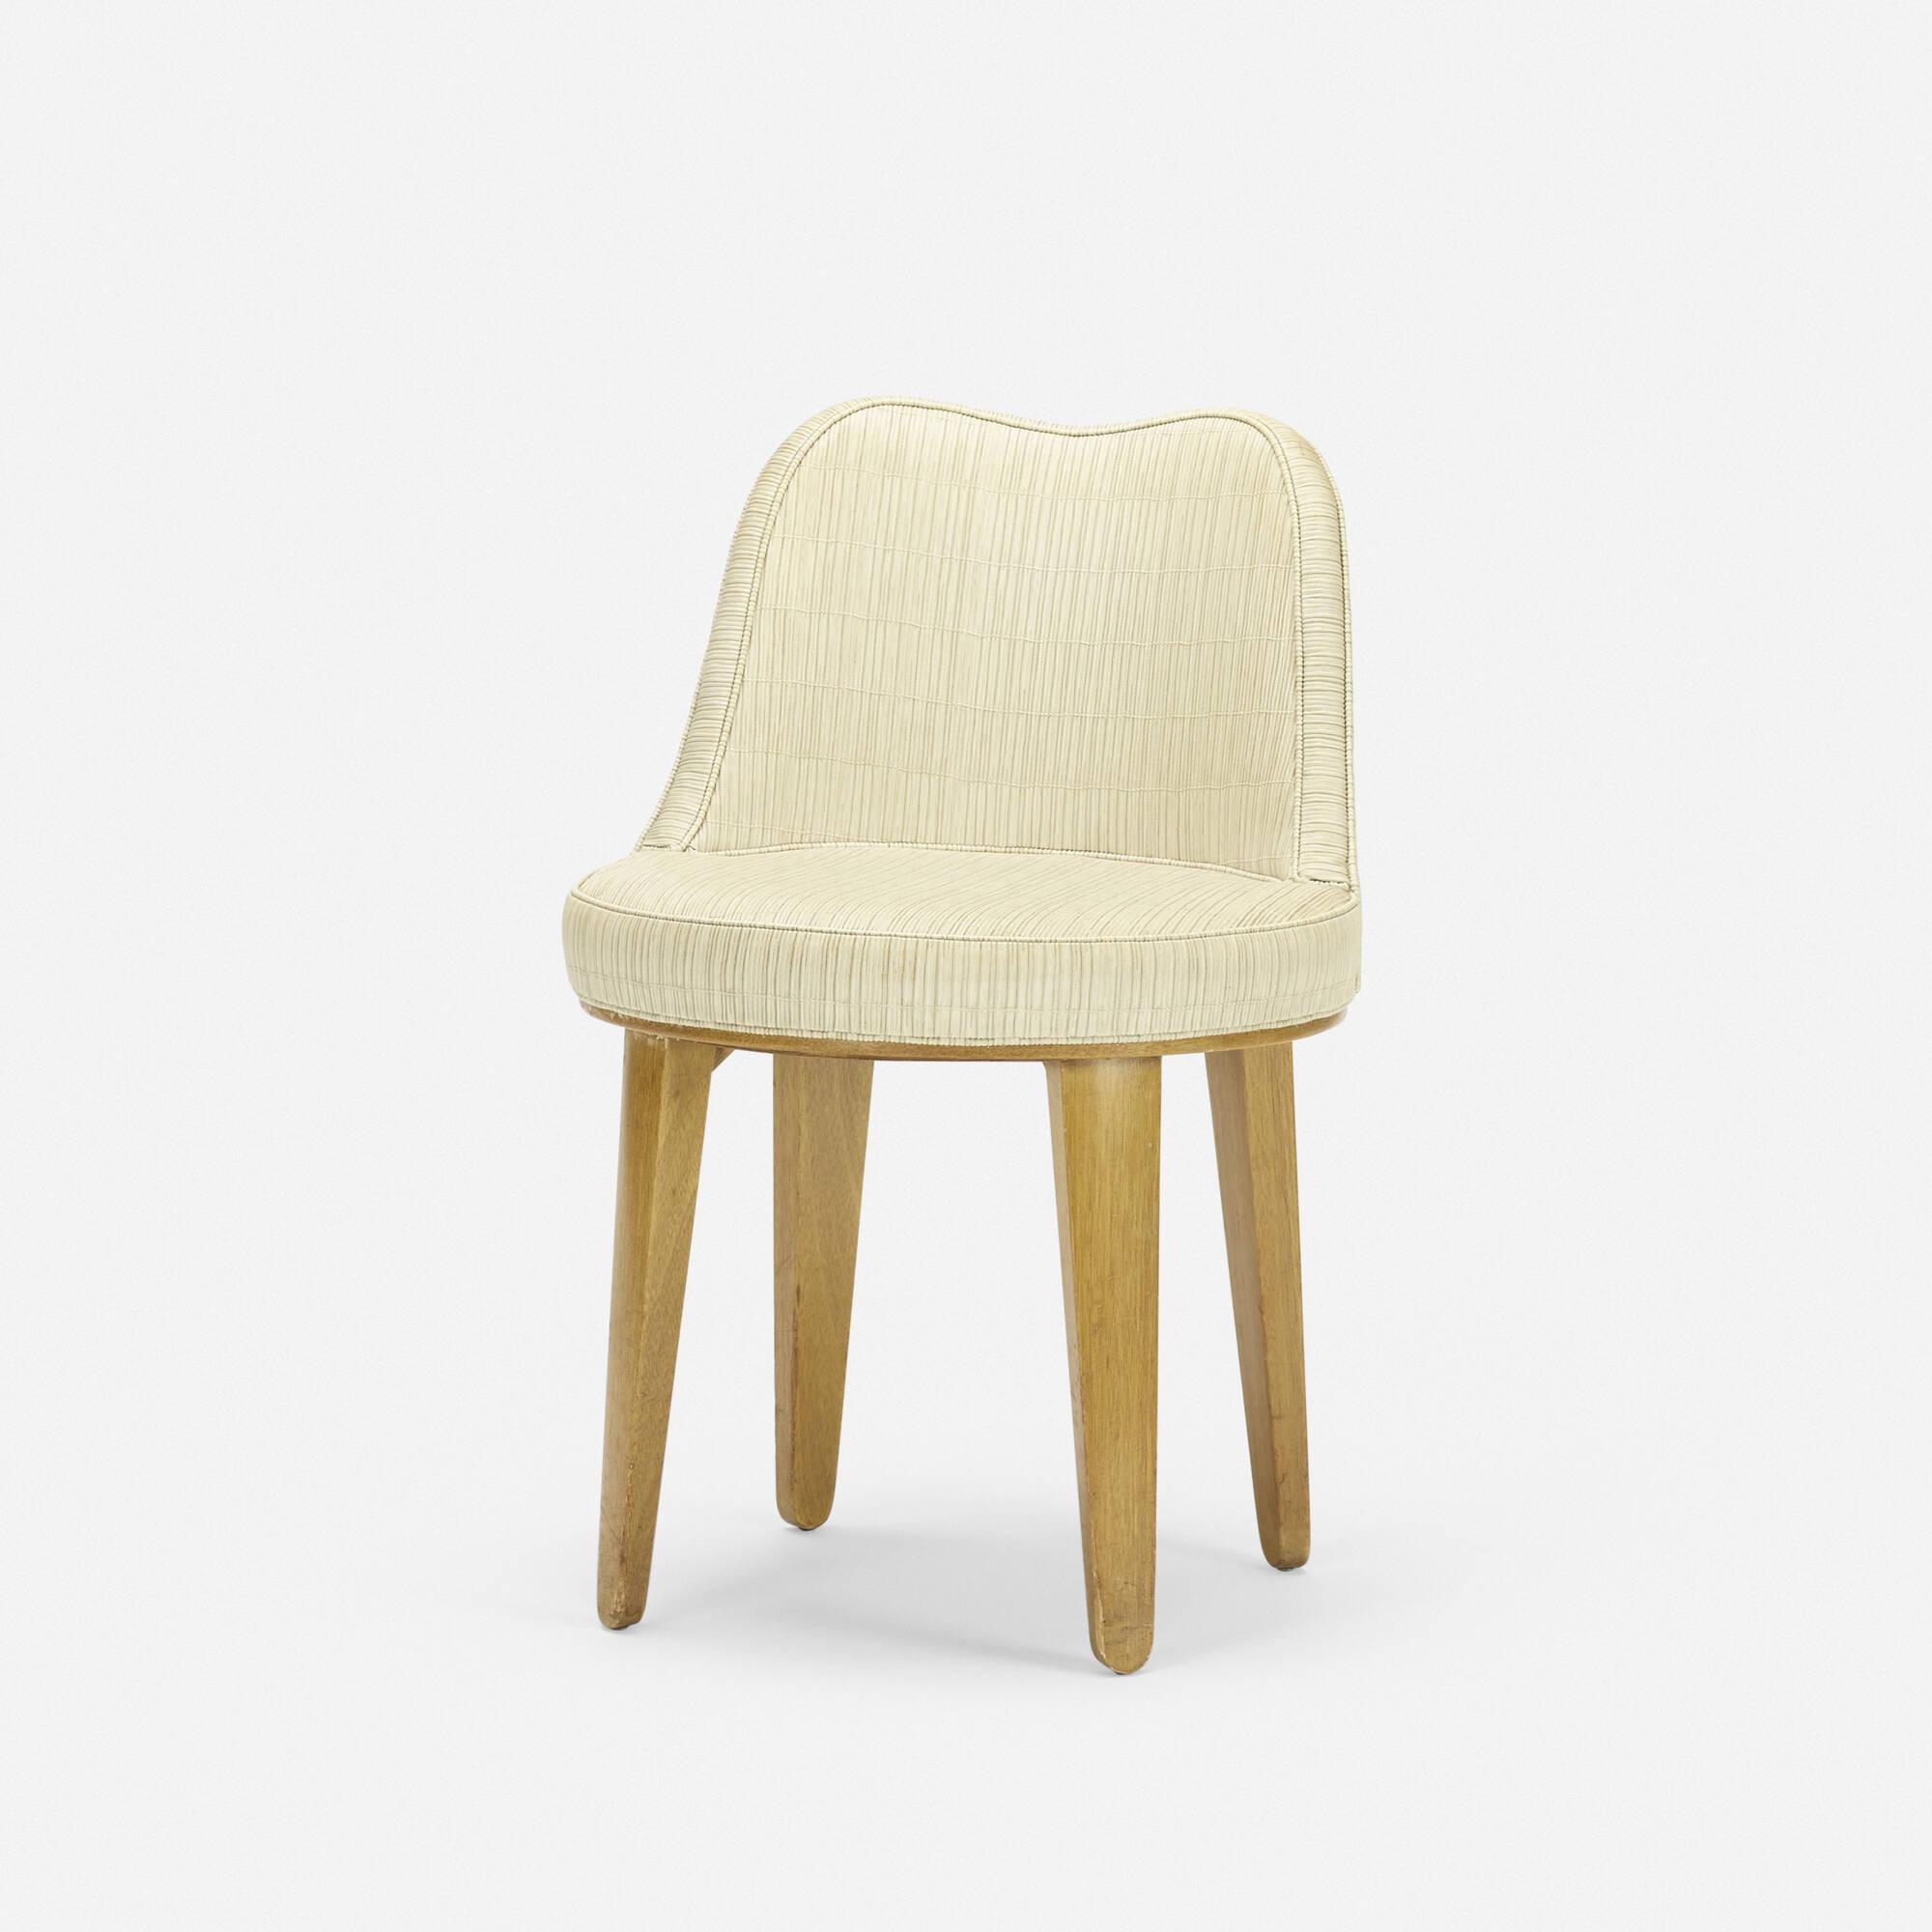 801: Edward Wormley / swivel chair (1 of 1)